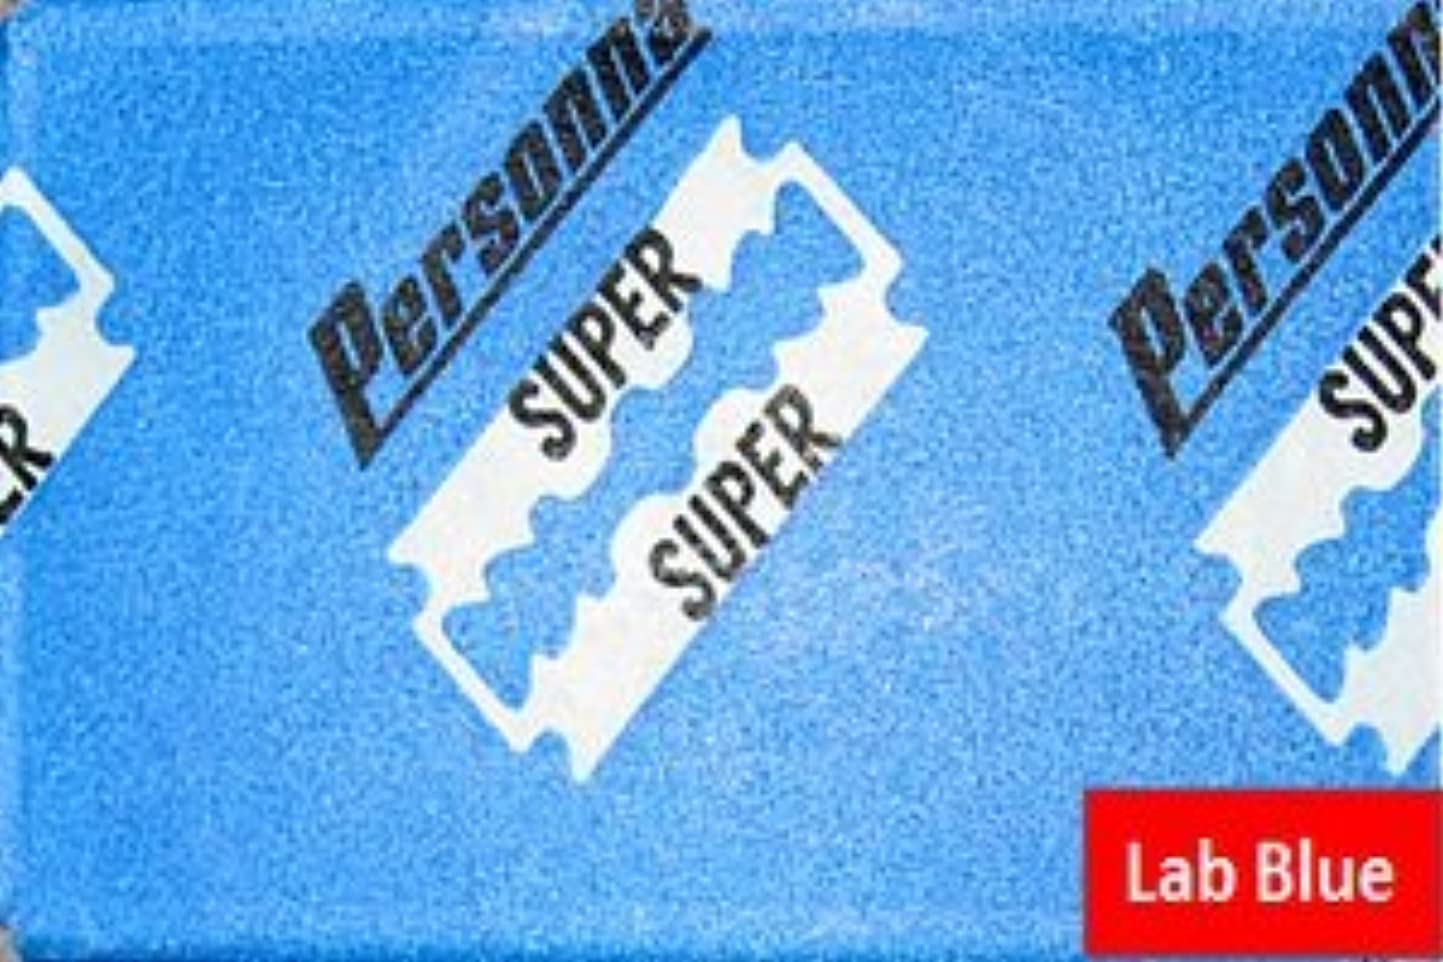 Personna Lab Blue 両刃替刃 5枚入り(5枚入り1 個セット)【並行輸入品】